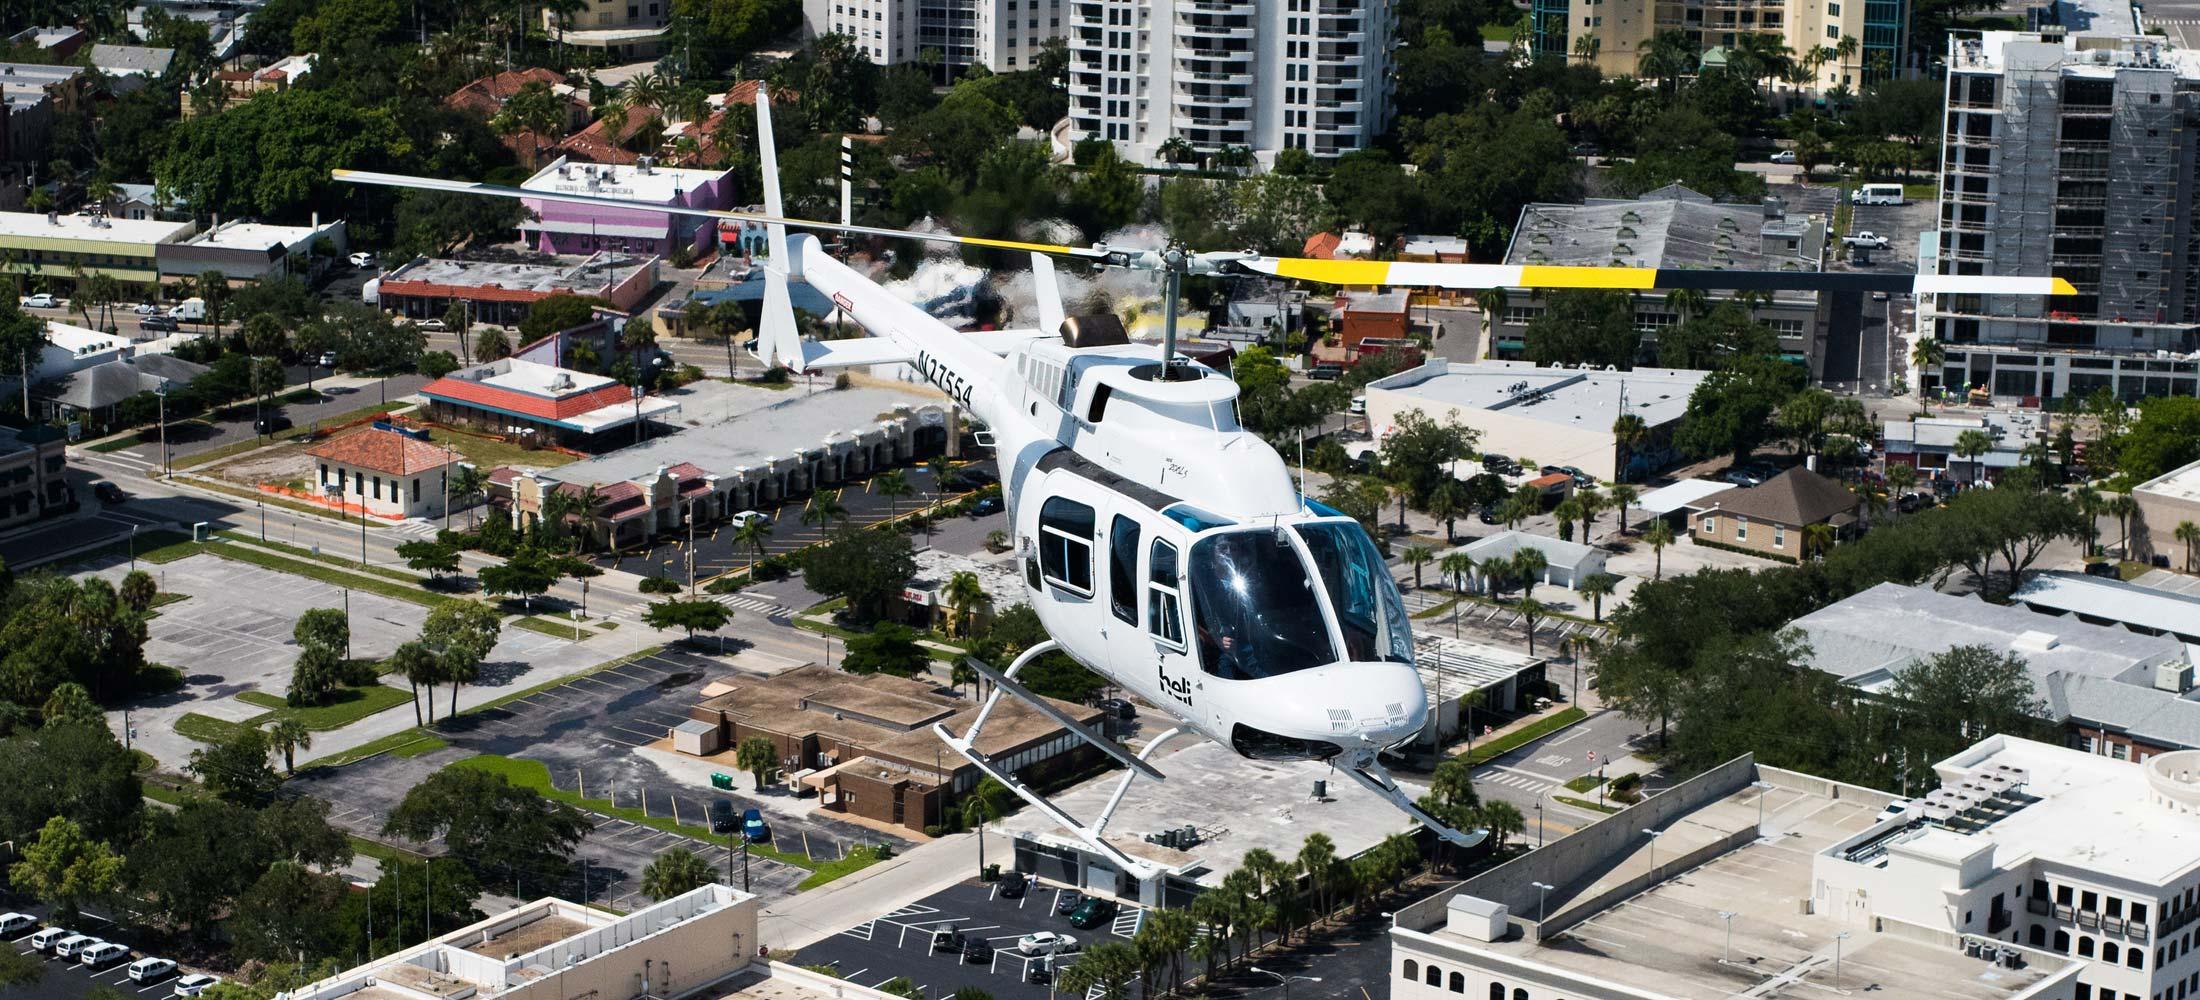 Heli Aviation - Sarasota Florida Tour